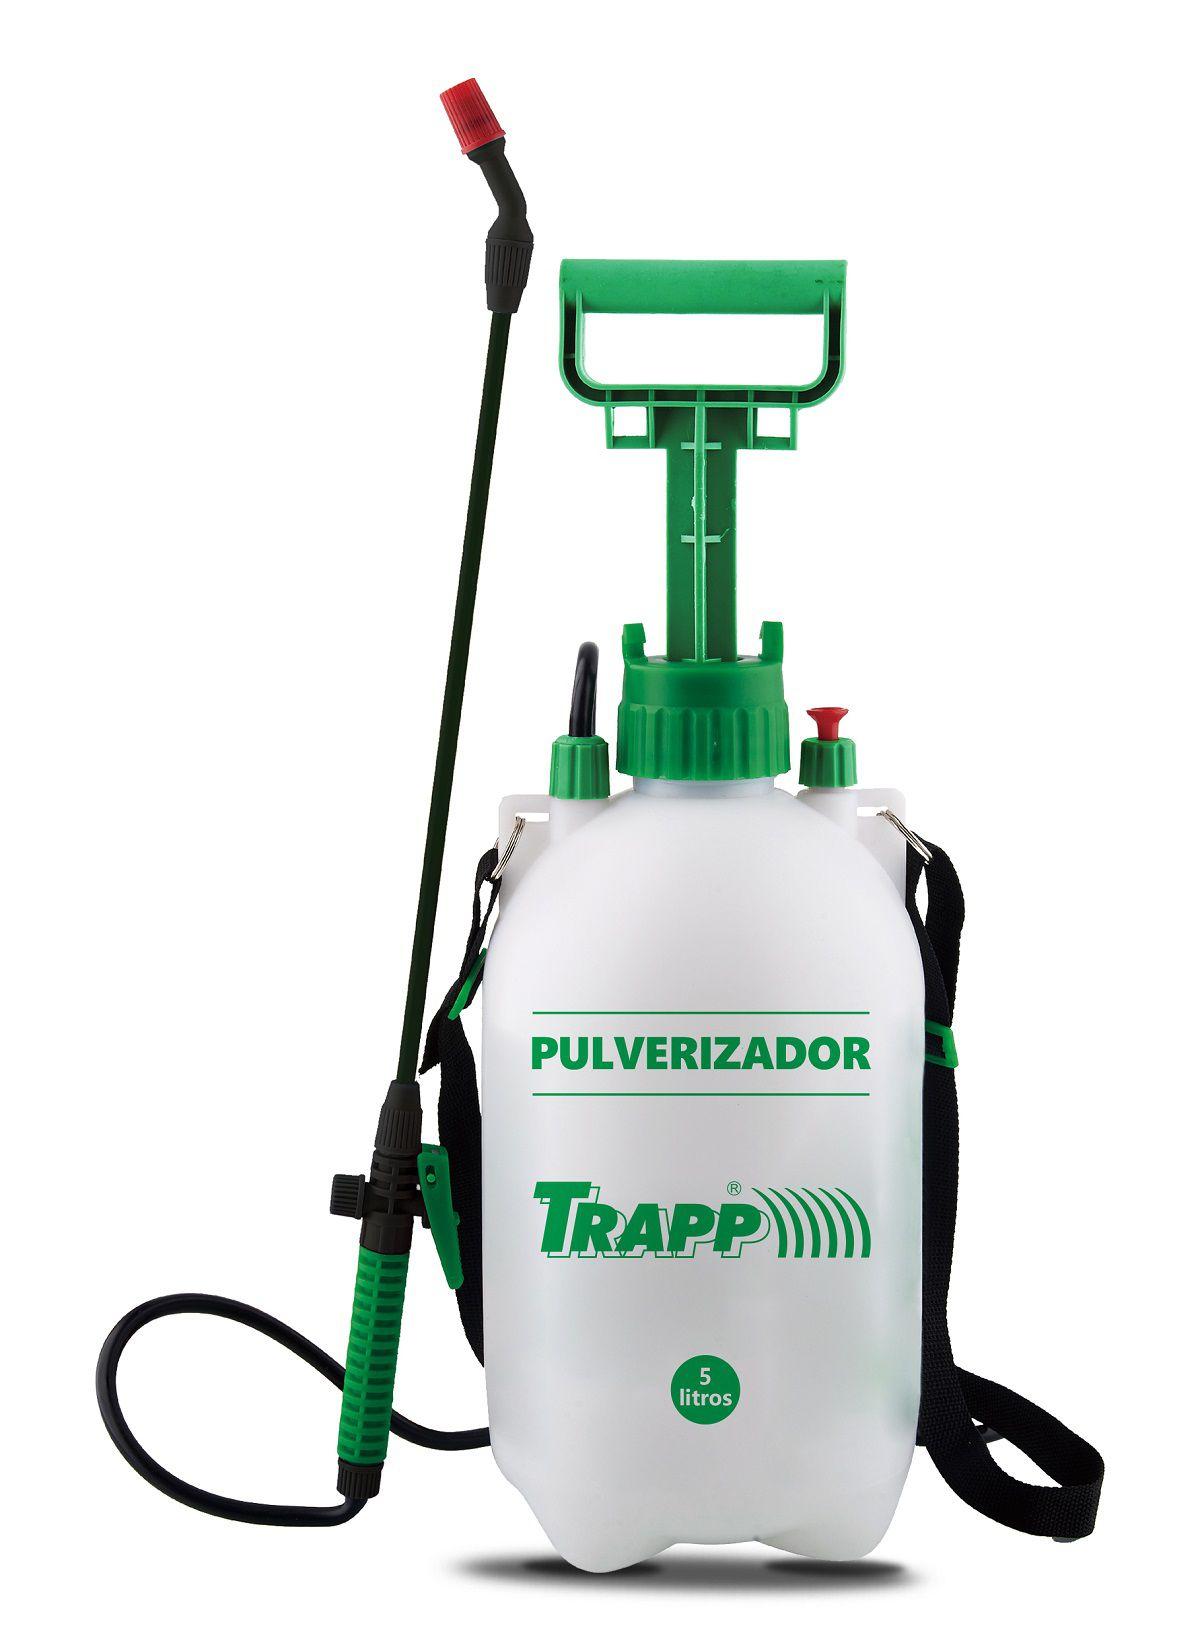 Pulverizador 5 litros SX CS5 Trapp